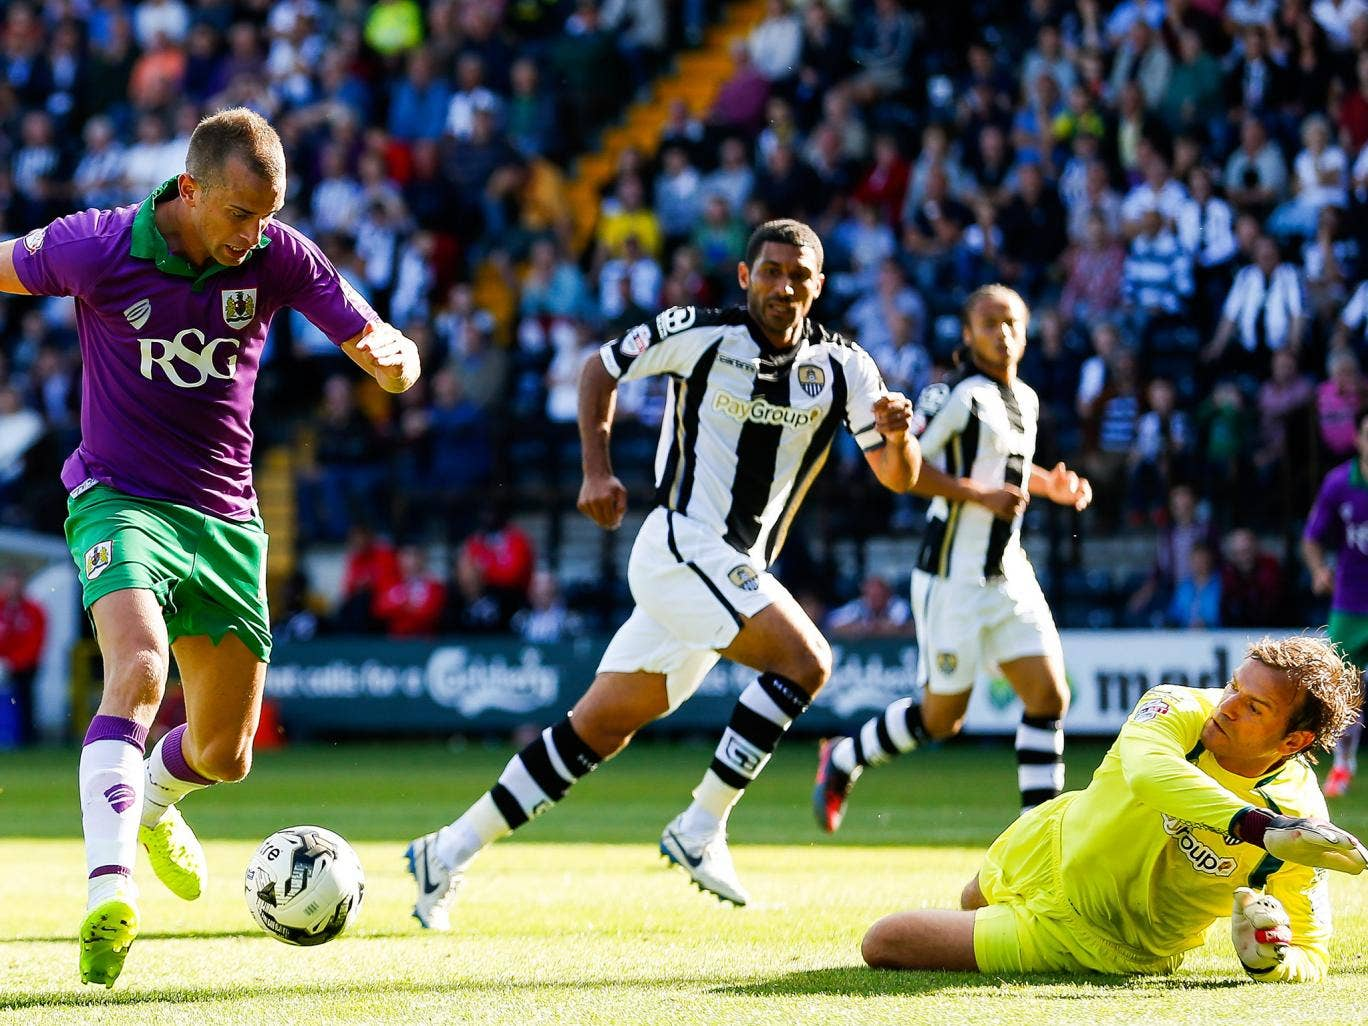 Bristol City's Aaron Wilbraham bears down on the Notts County goal last week